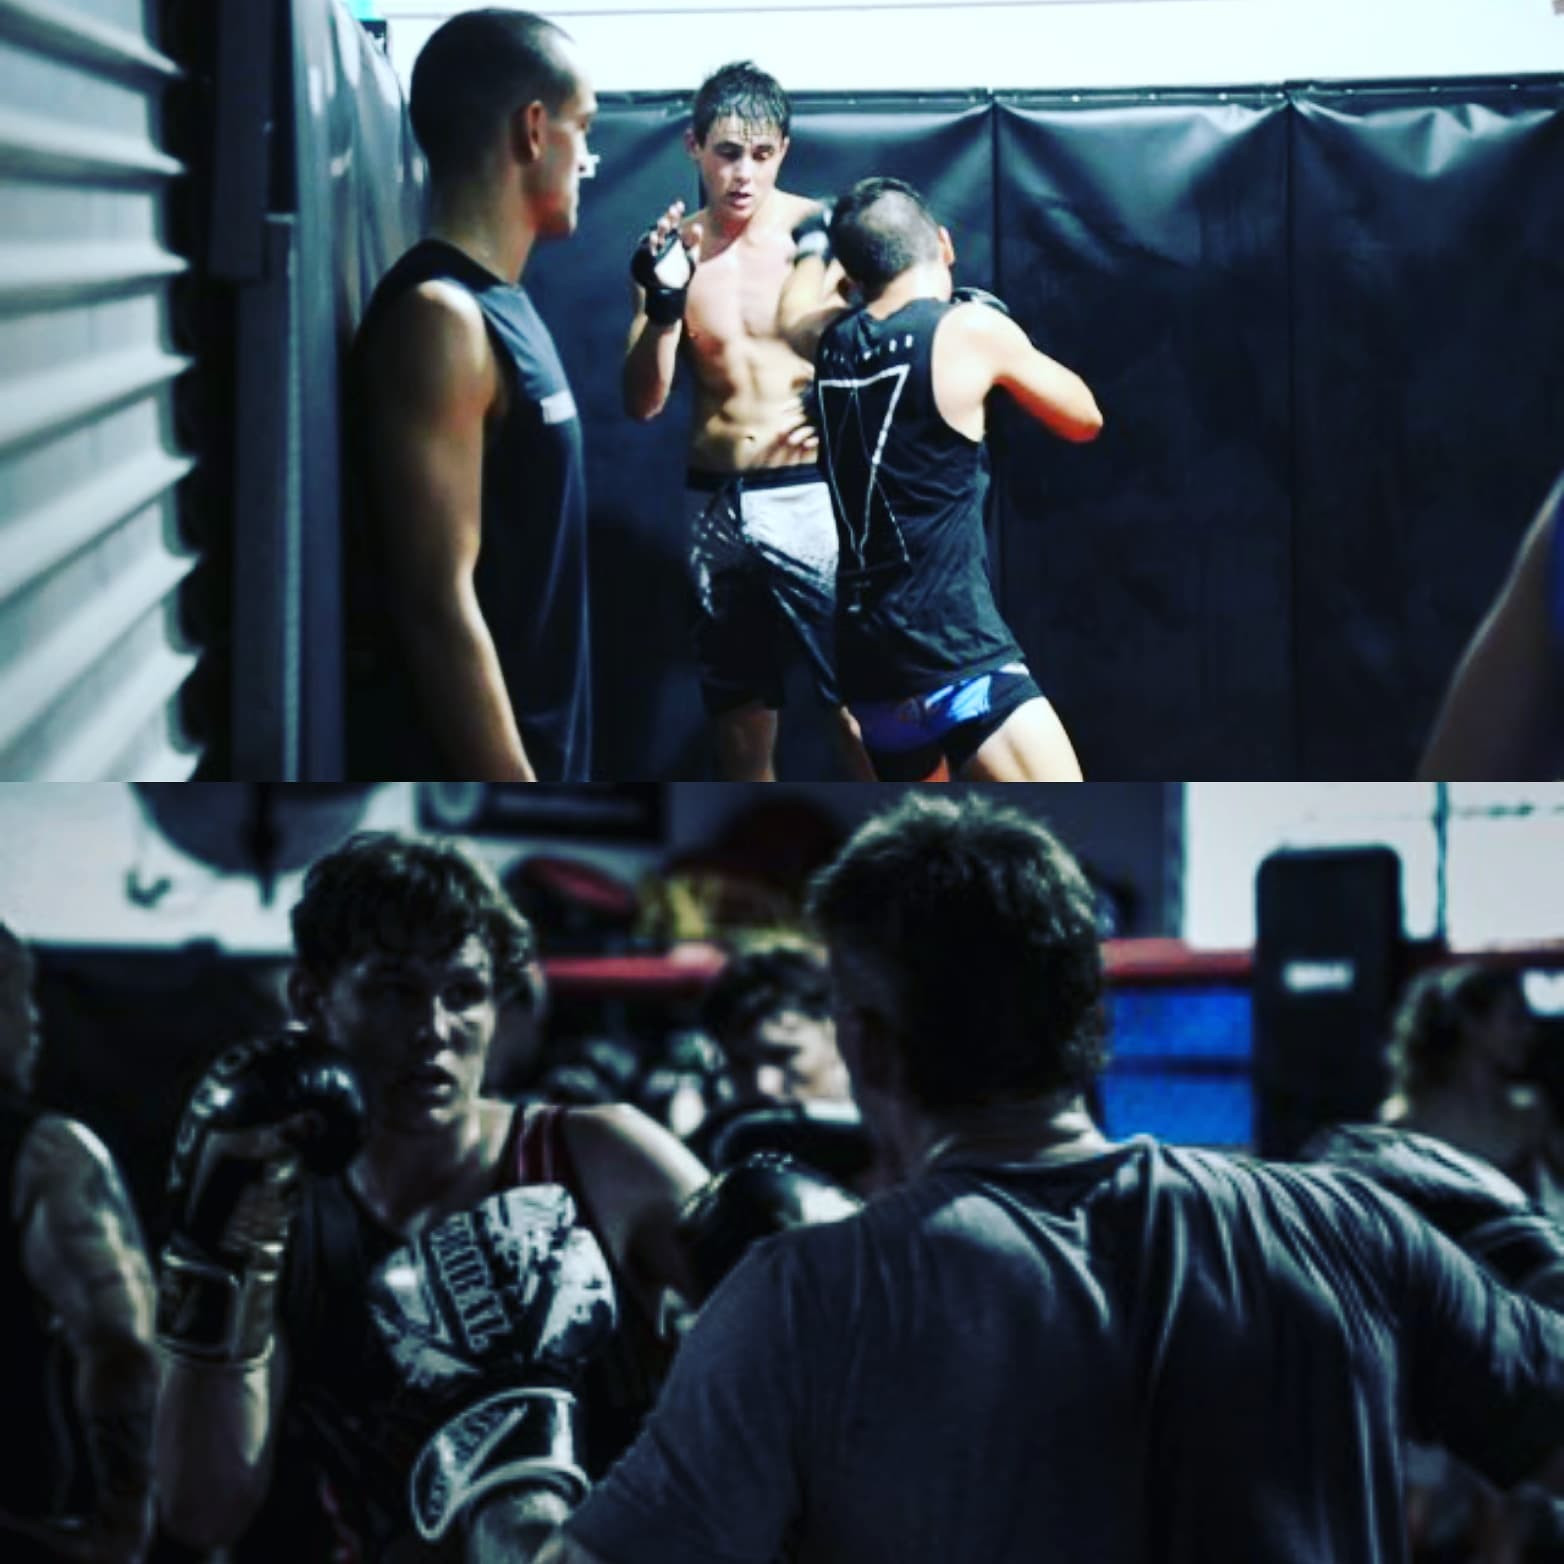 MMA Conditioning